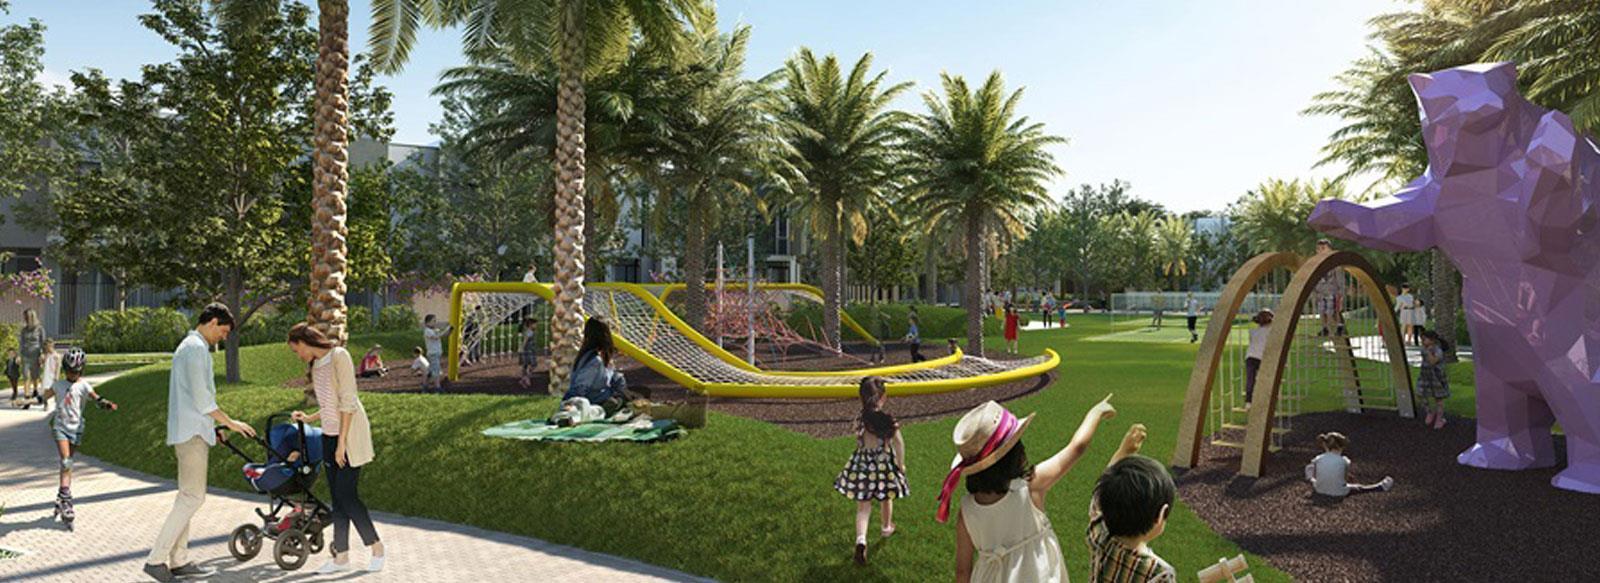 Lush Green Parks